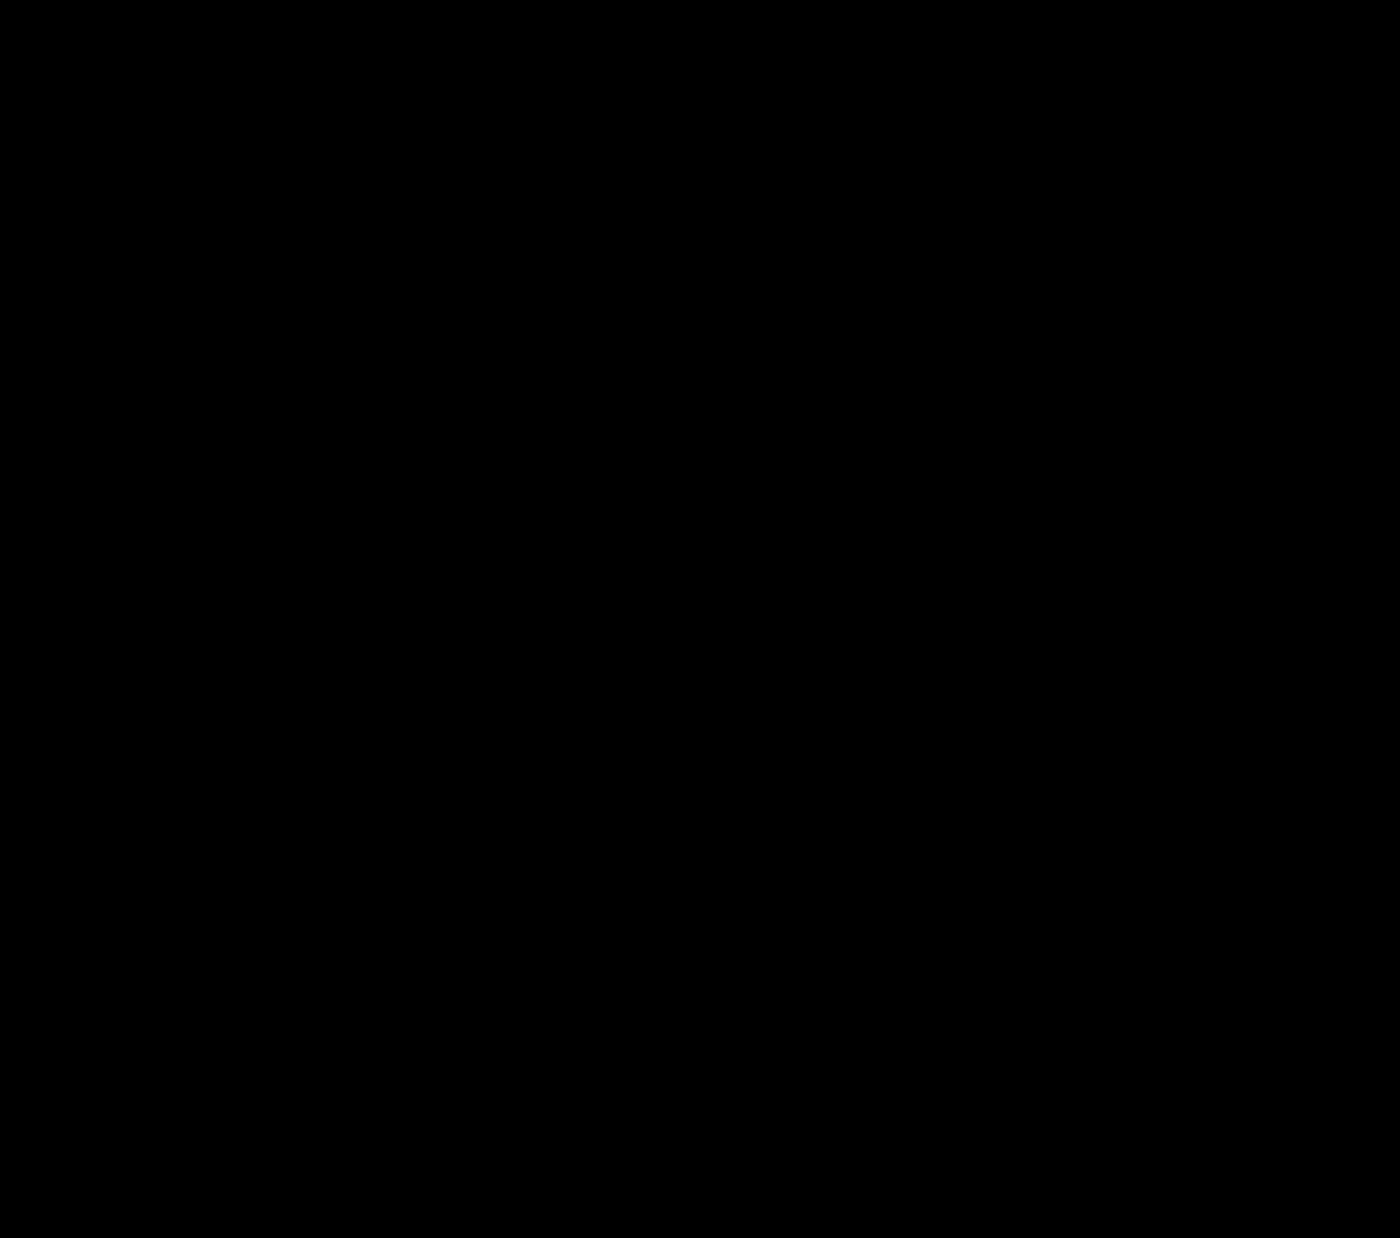 aktionshaus-terrano-grundriss-og